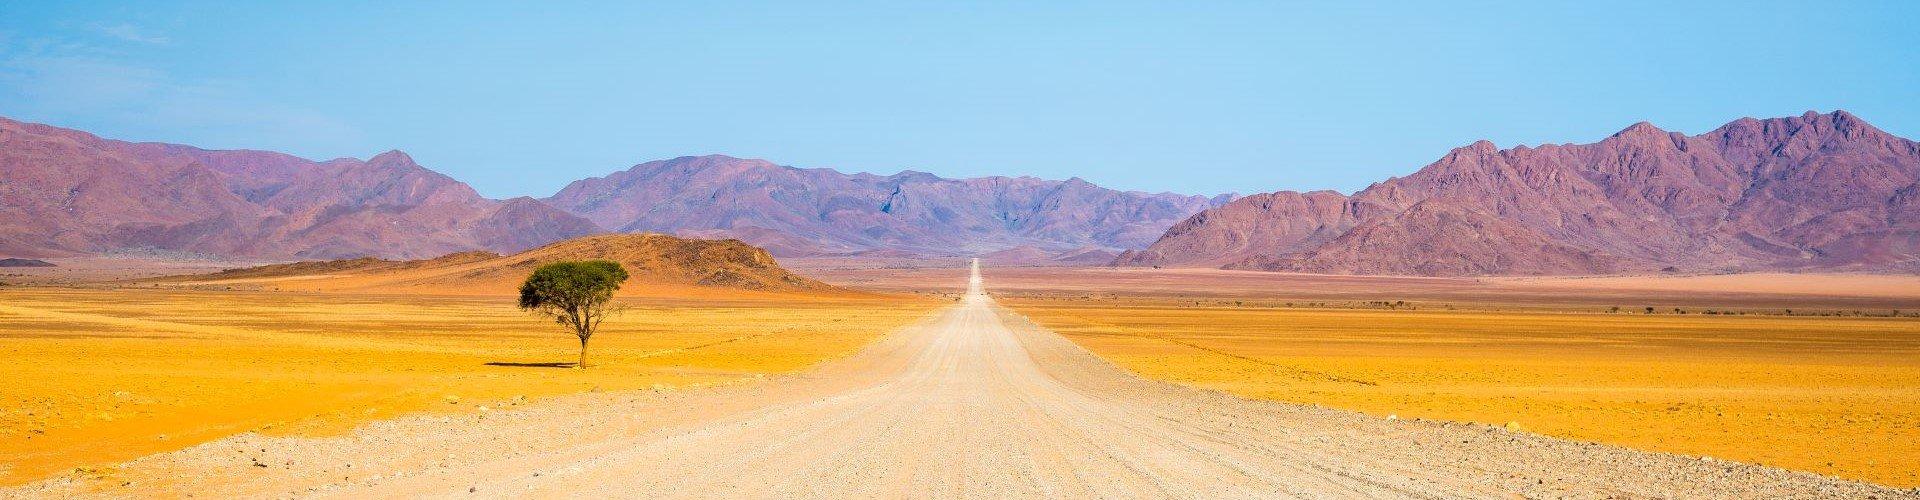 Familienurlaub in Namibia